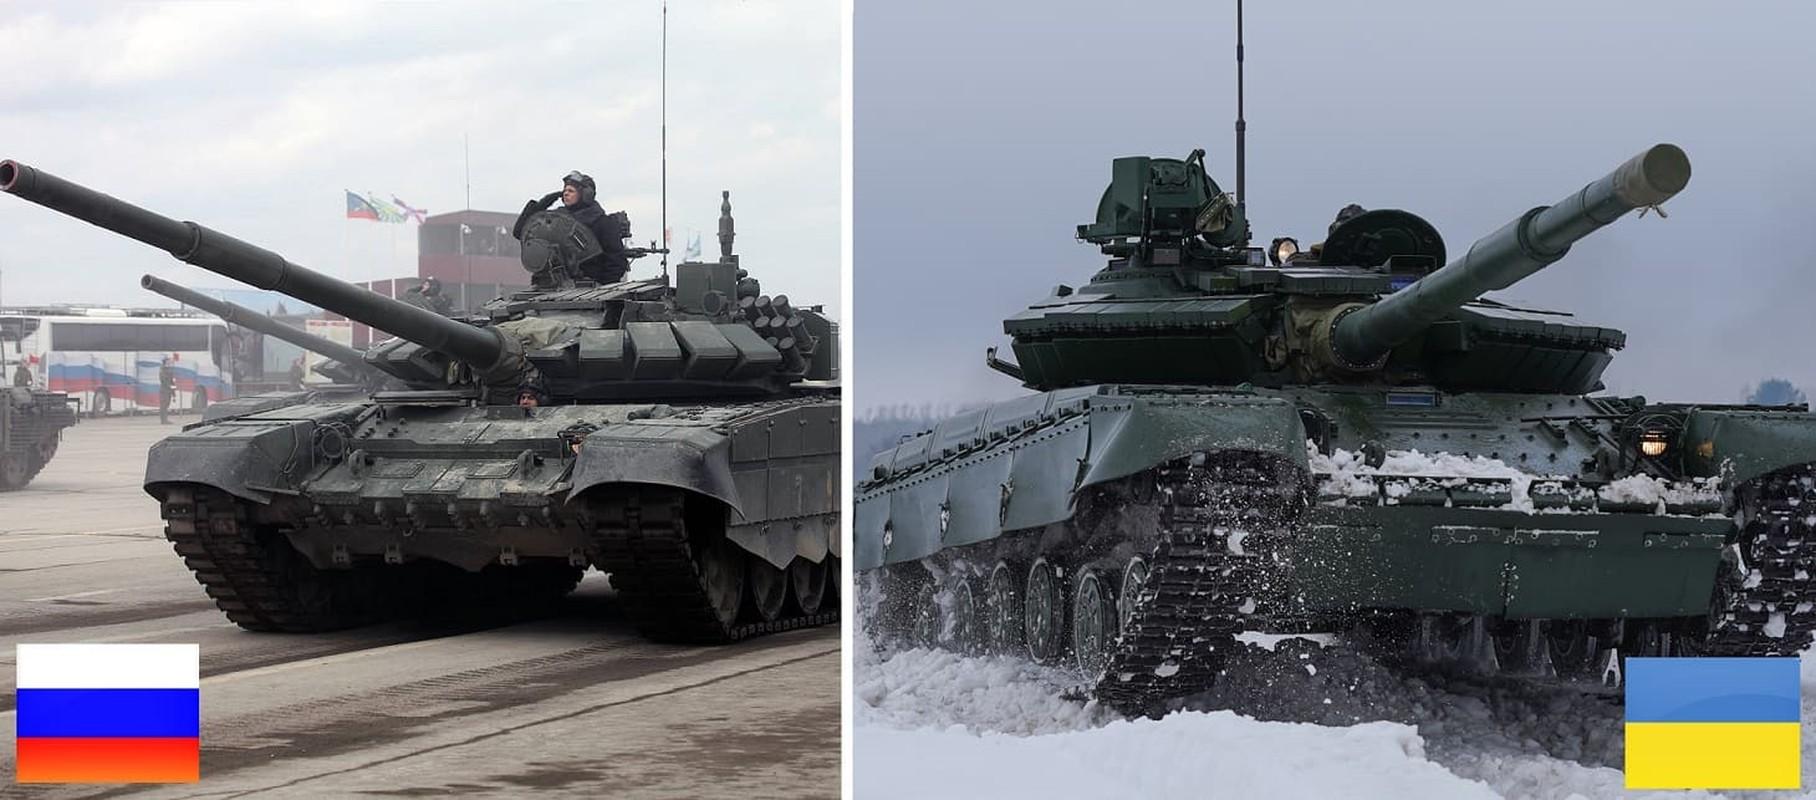 So sanh suc manh giua luc luong Luc quan Ukraine va Nga-Hinh-4